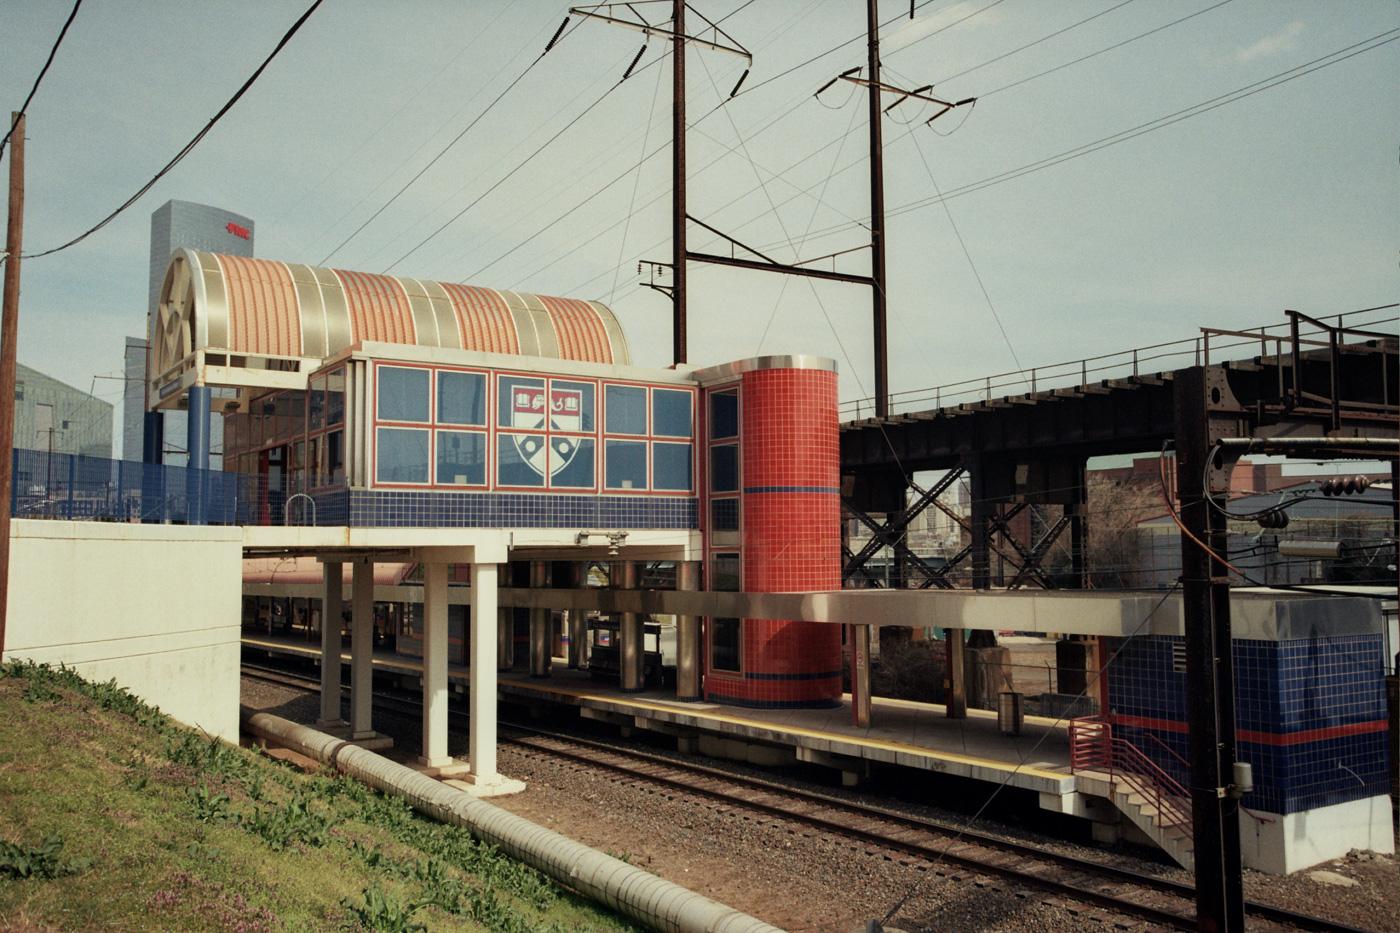 Penn Medicine Station